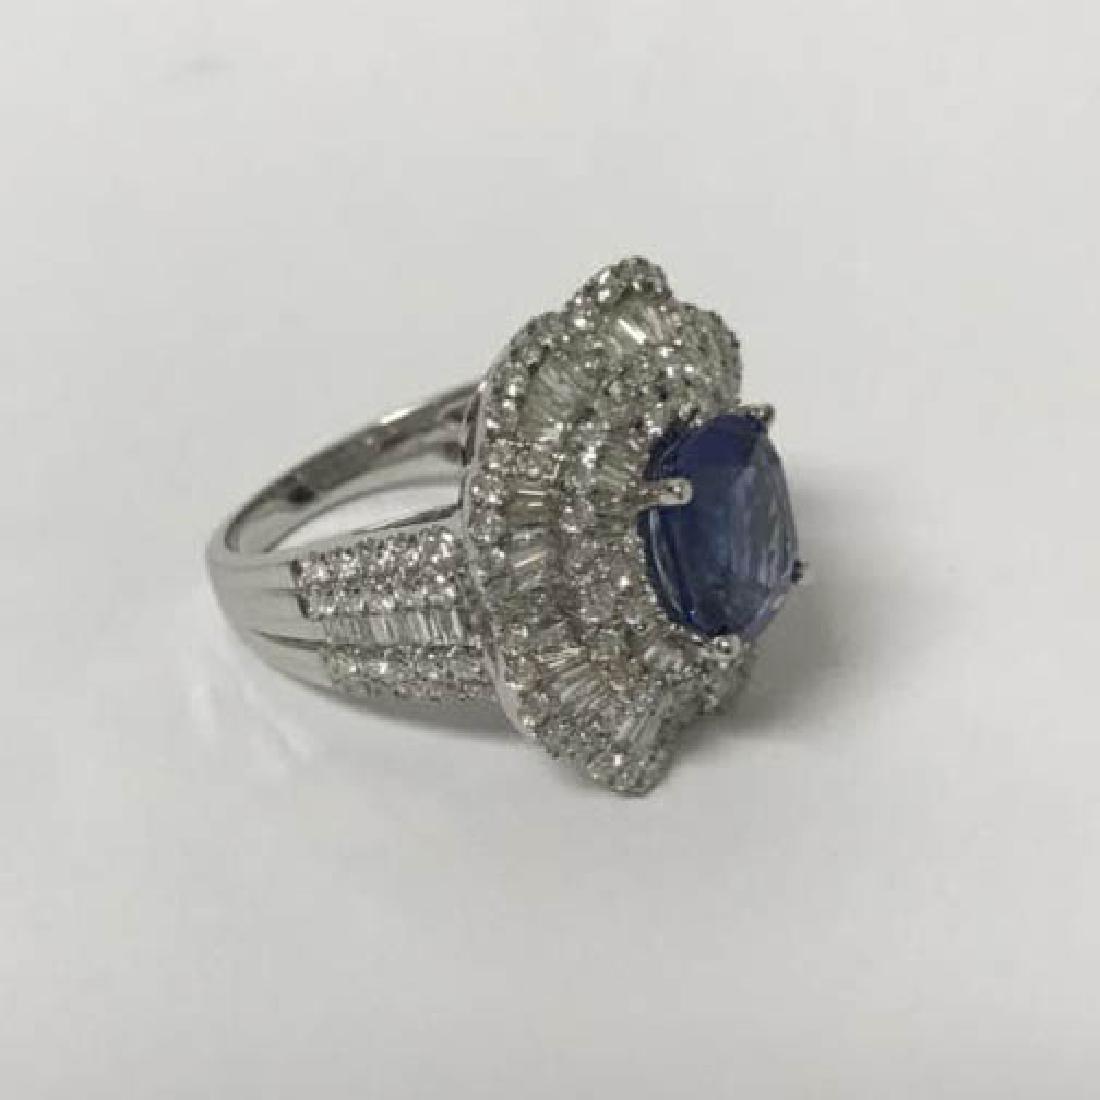 18k gold set diamond 3.48 carat sapphire ring